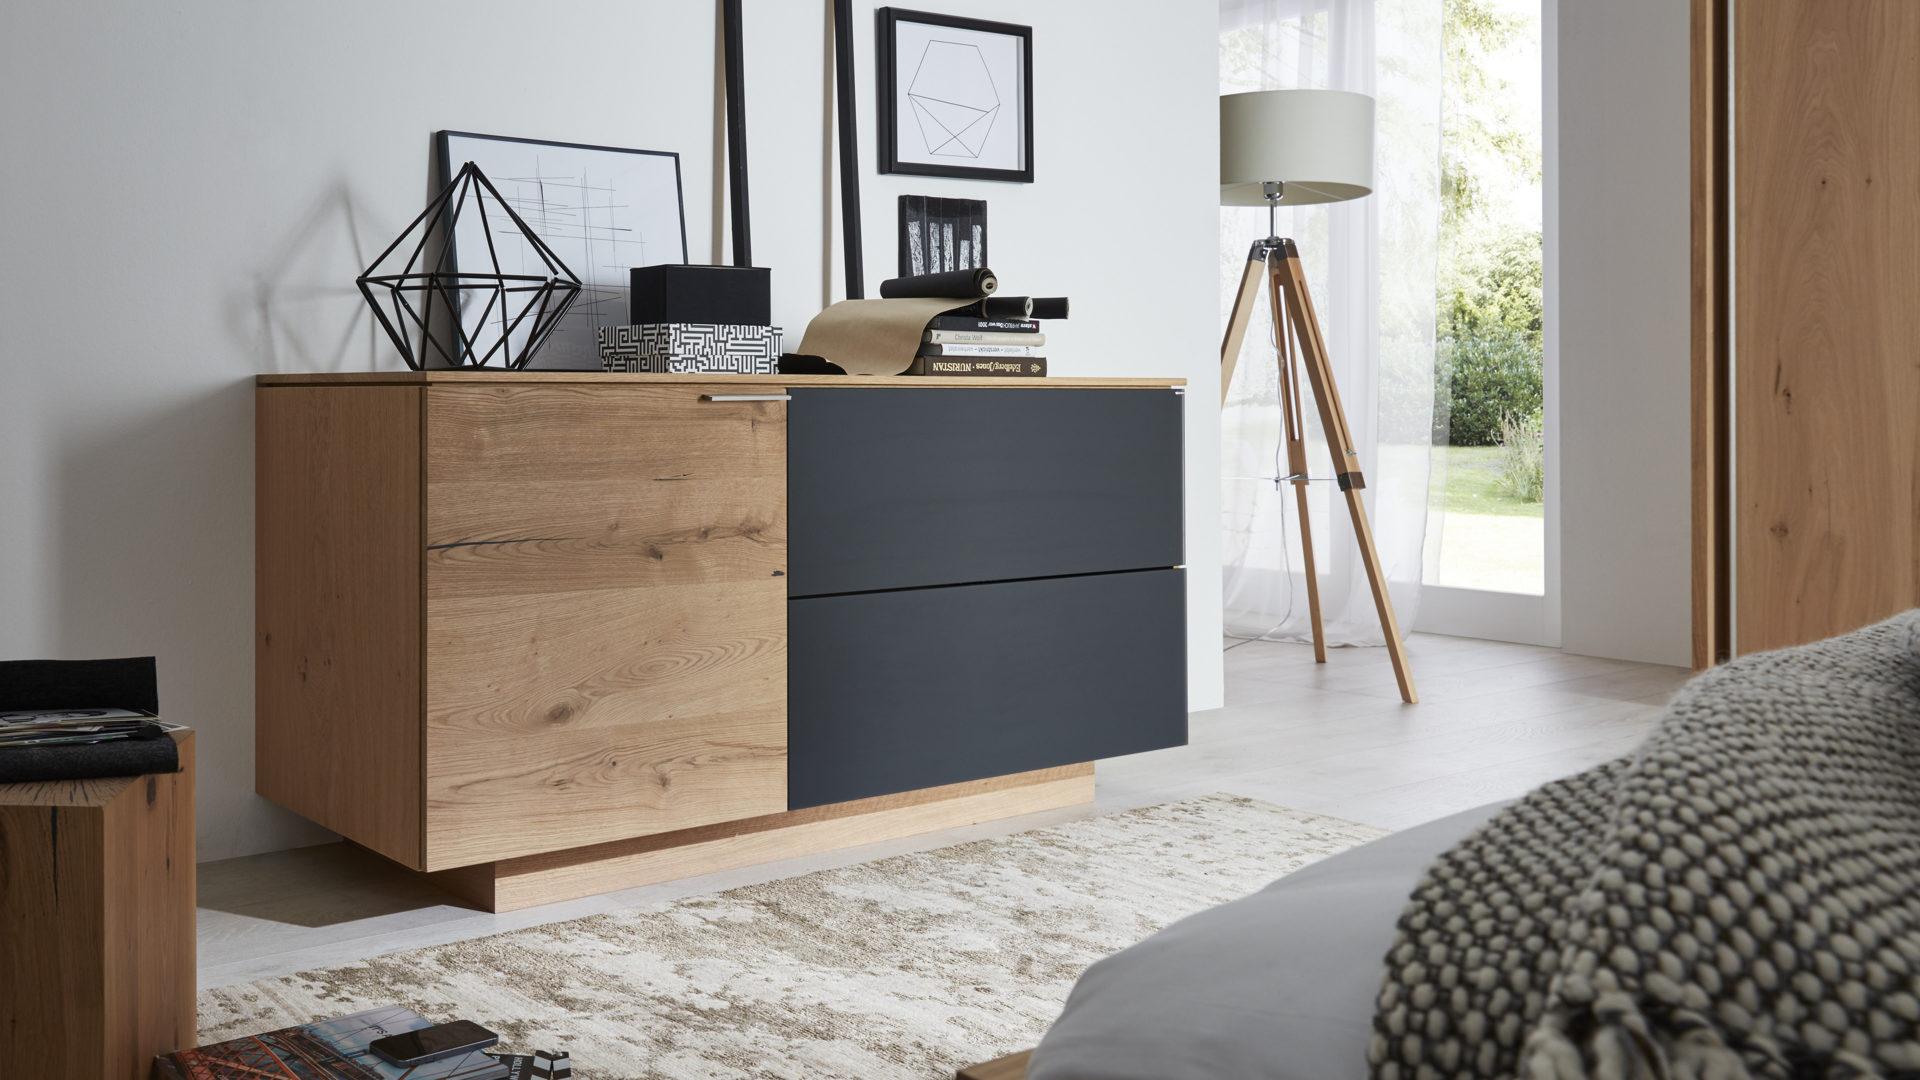 Interliving Schlafzimmer Serie 1004 – Kommode